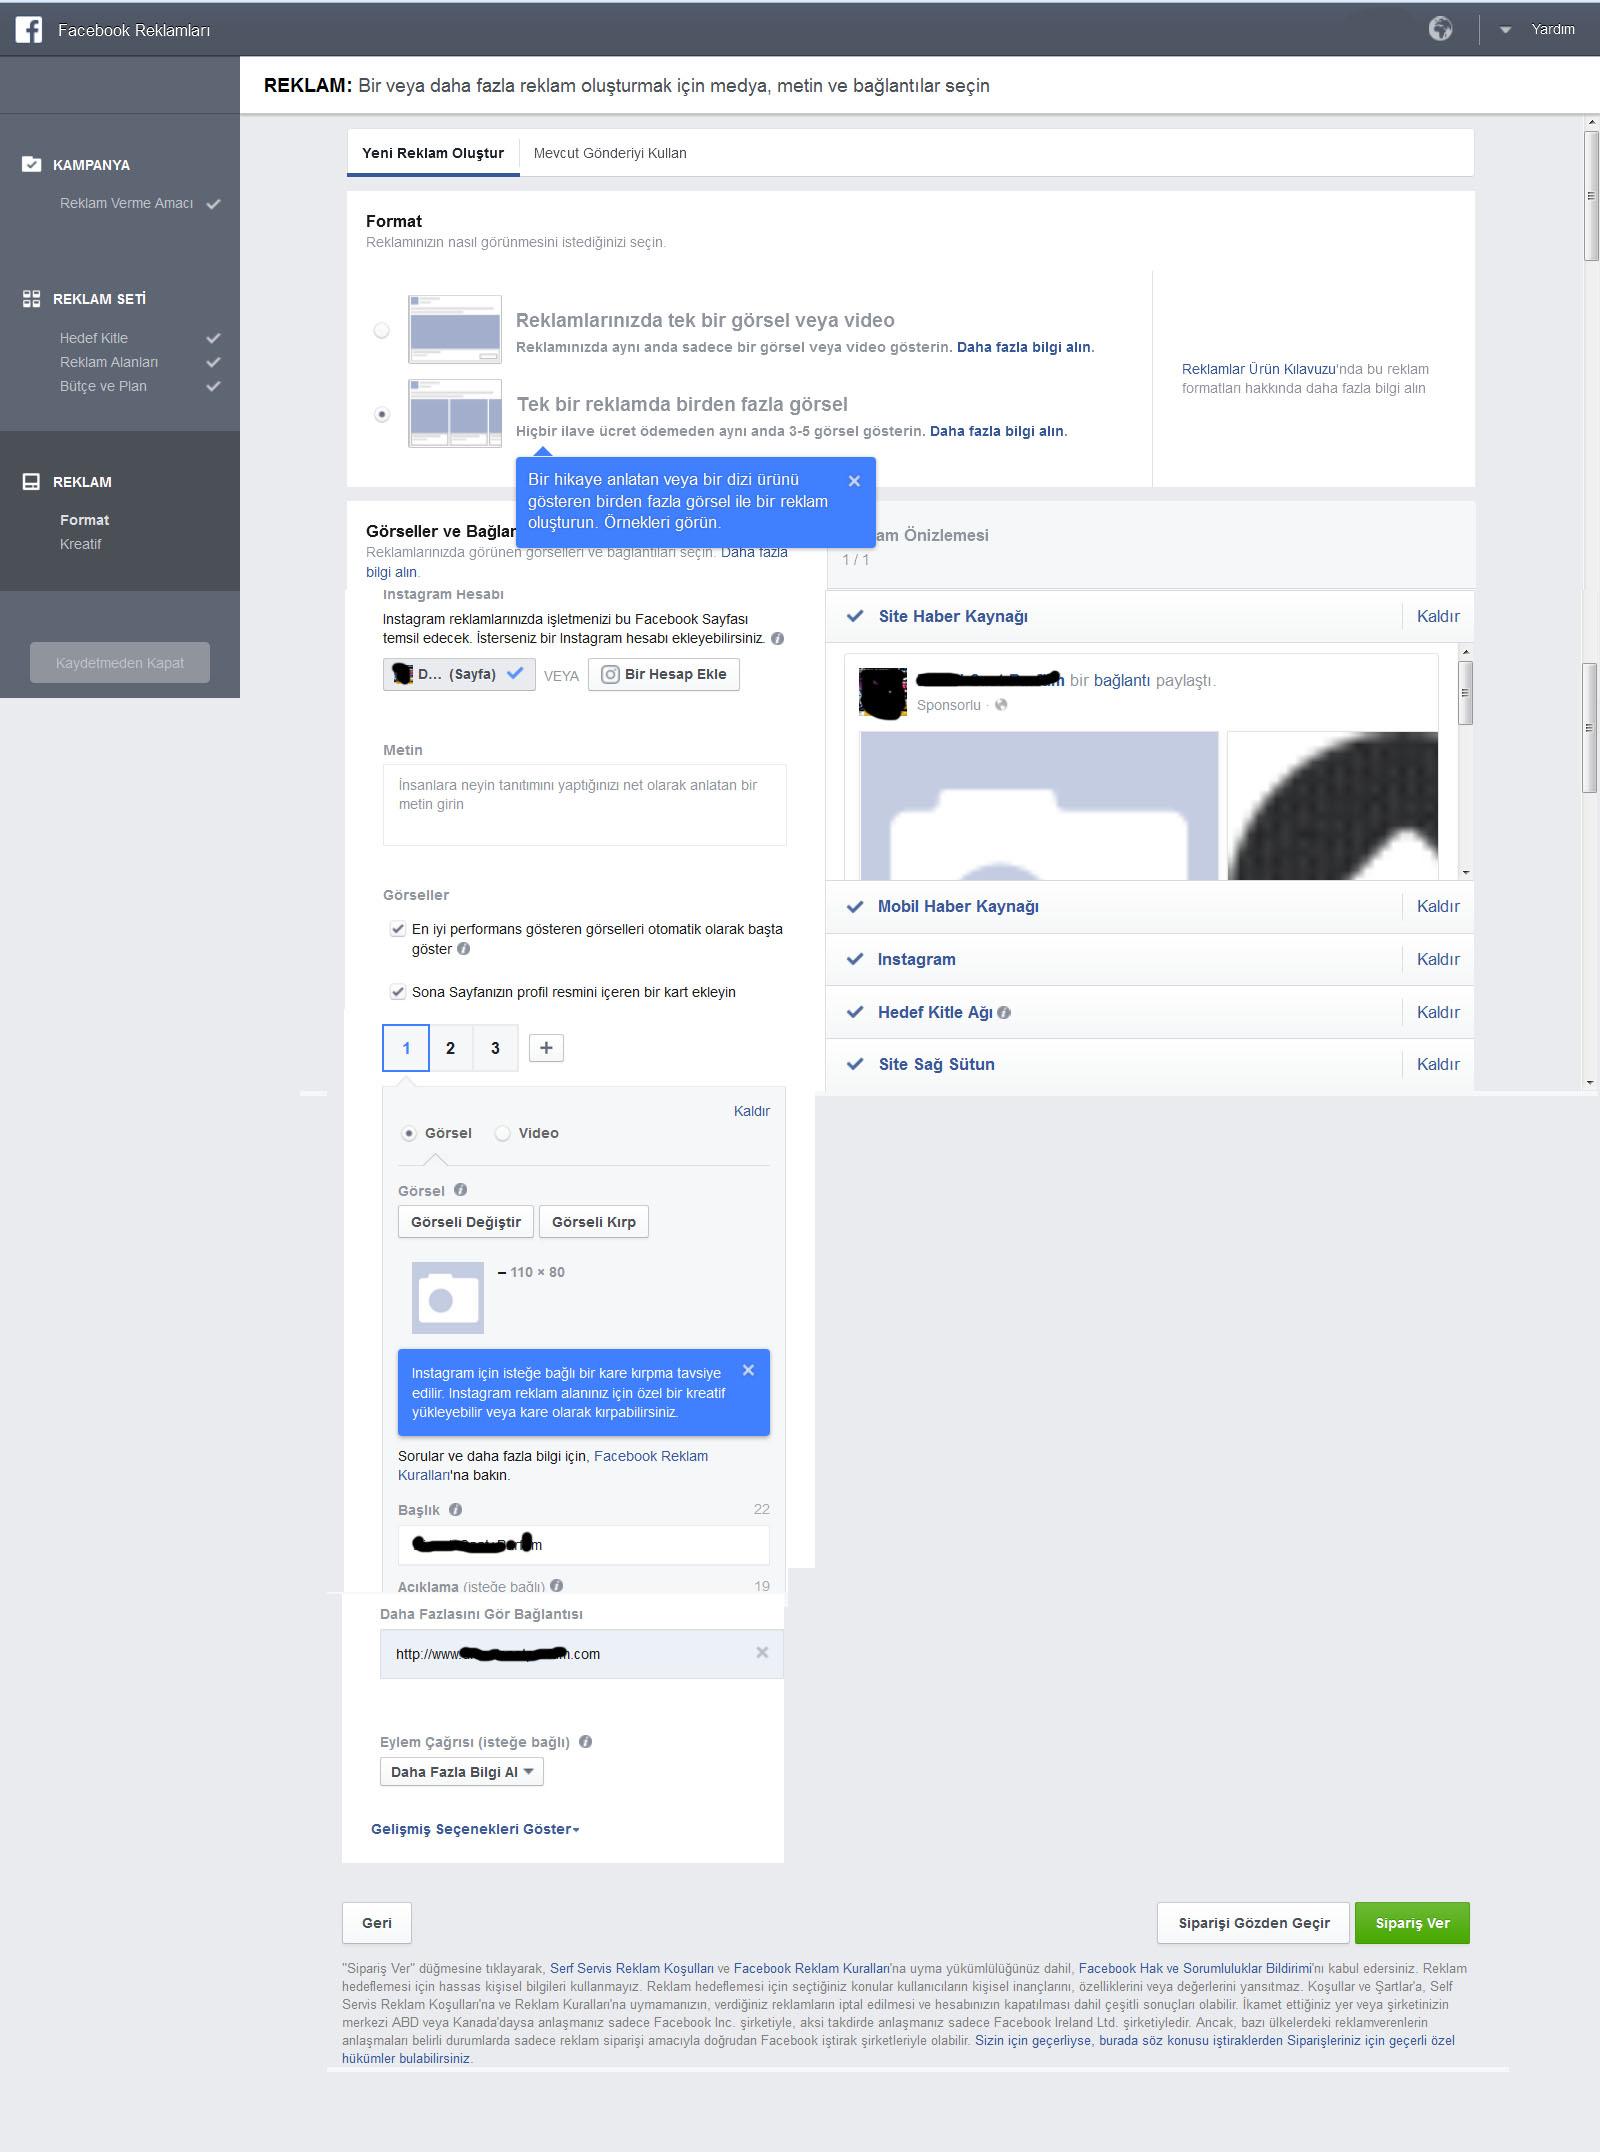 facebook-reklami-5-adim